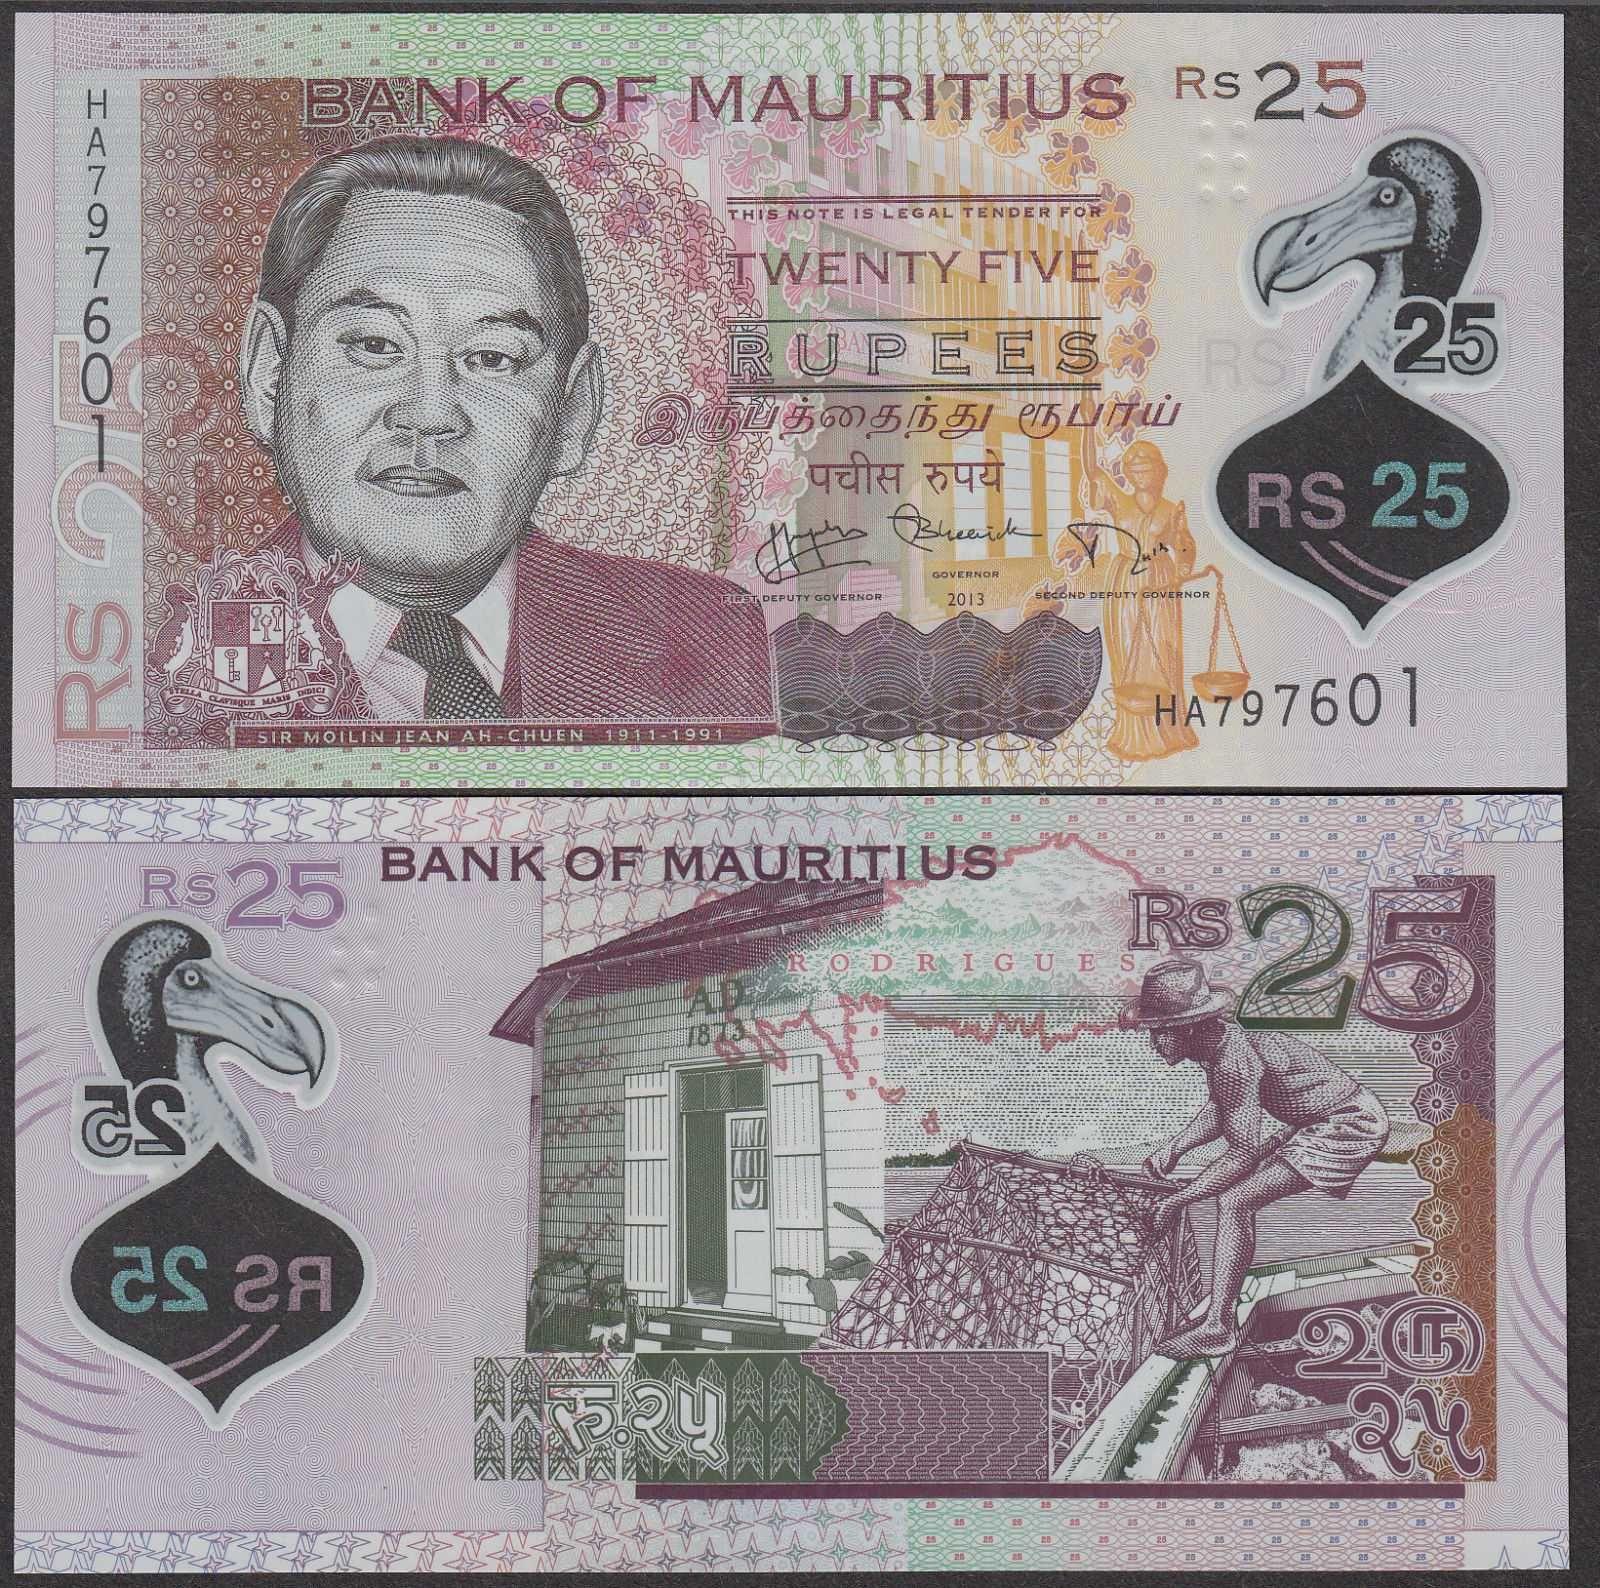 Zambia P-28 50 Kwacha Year ND 1989 Uncirculated Banknote